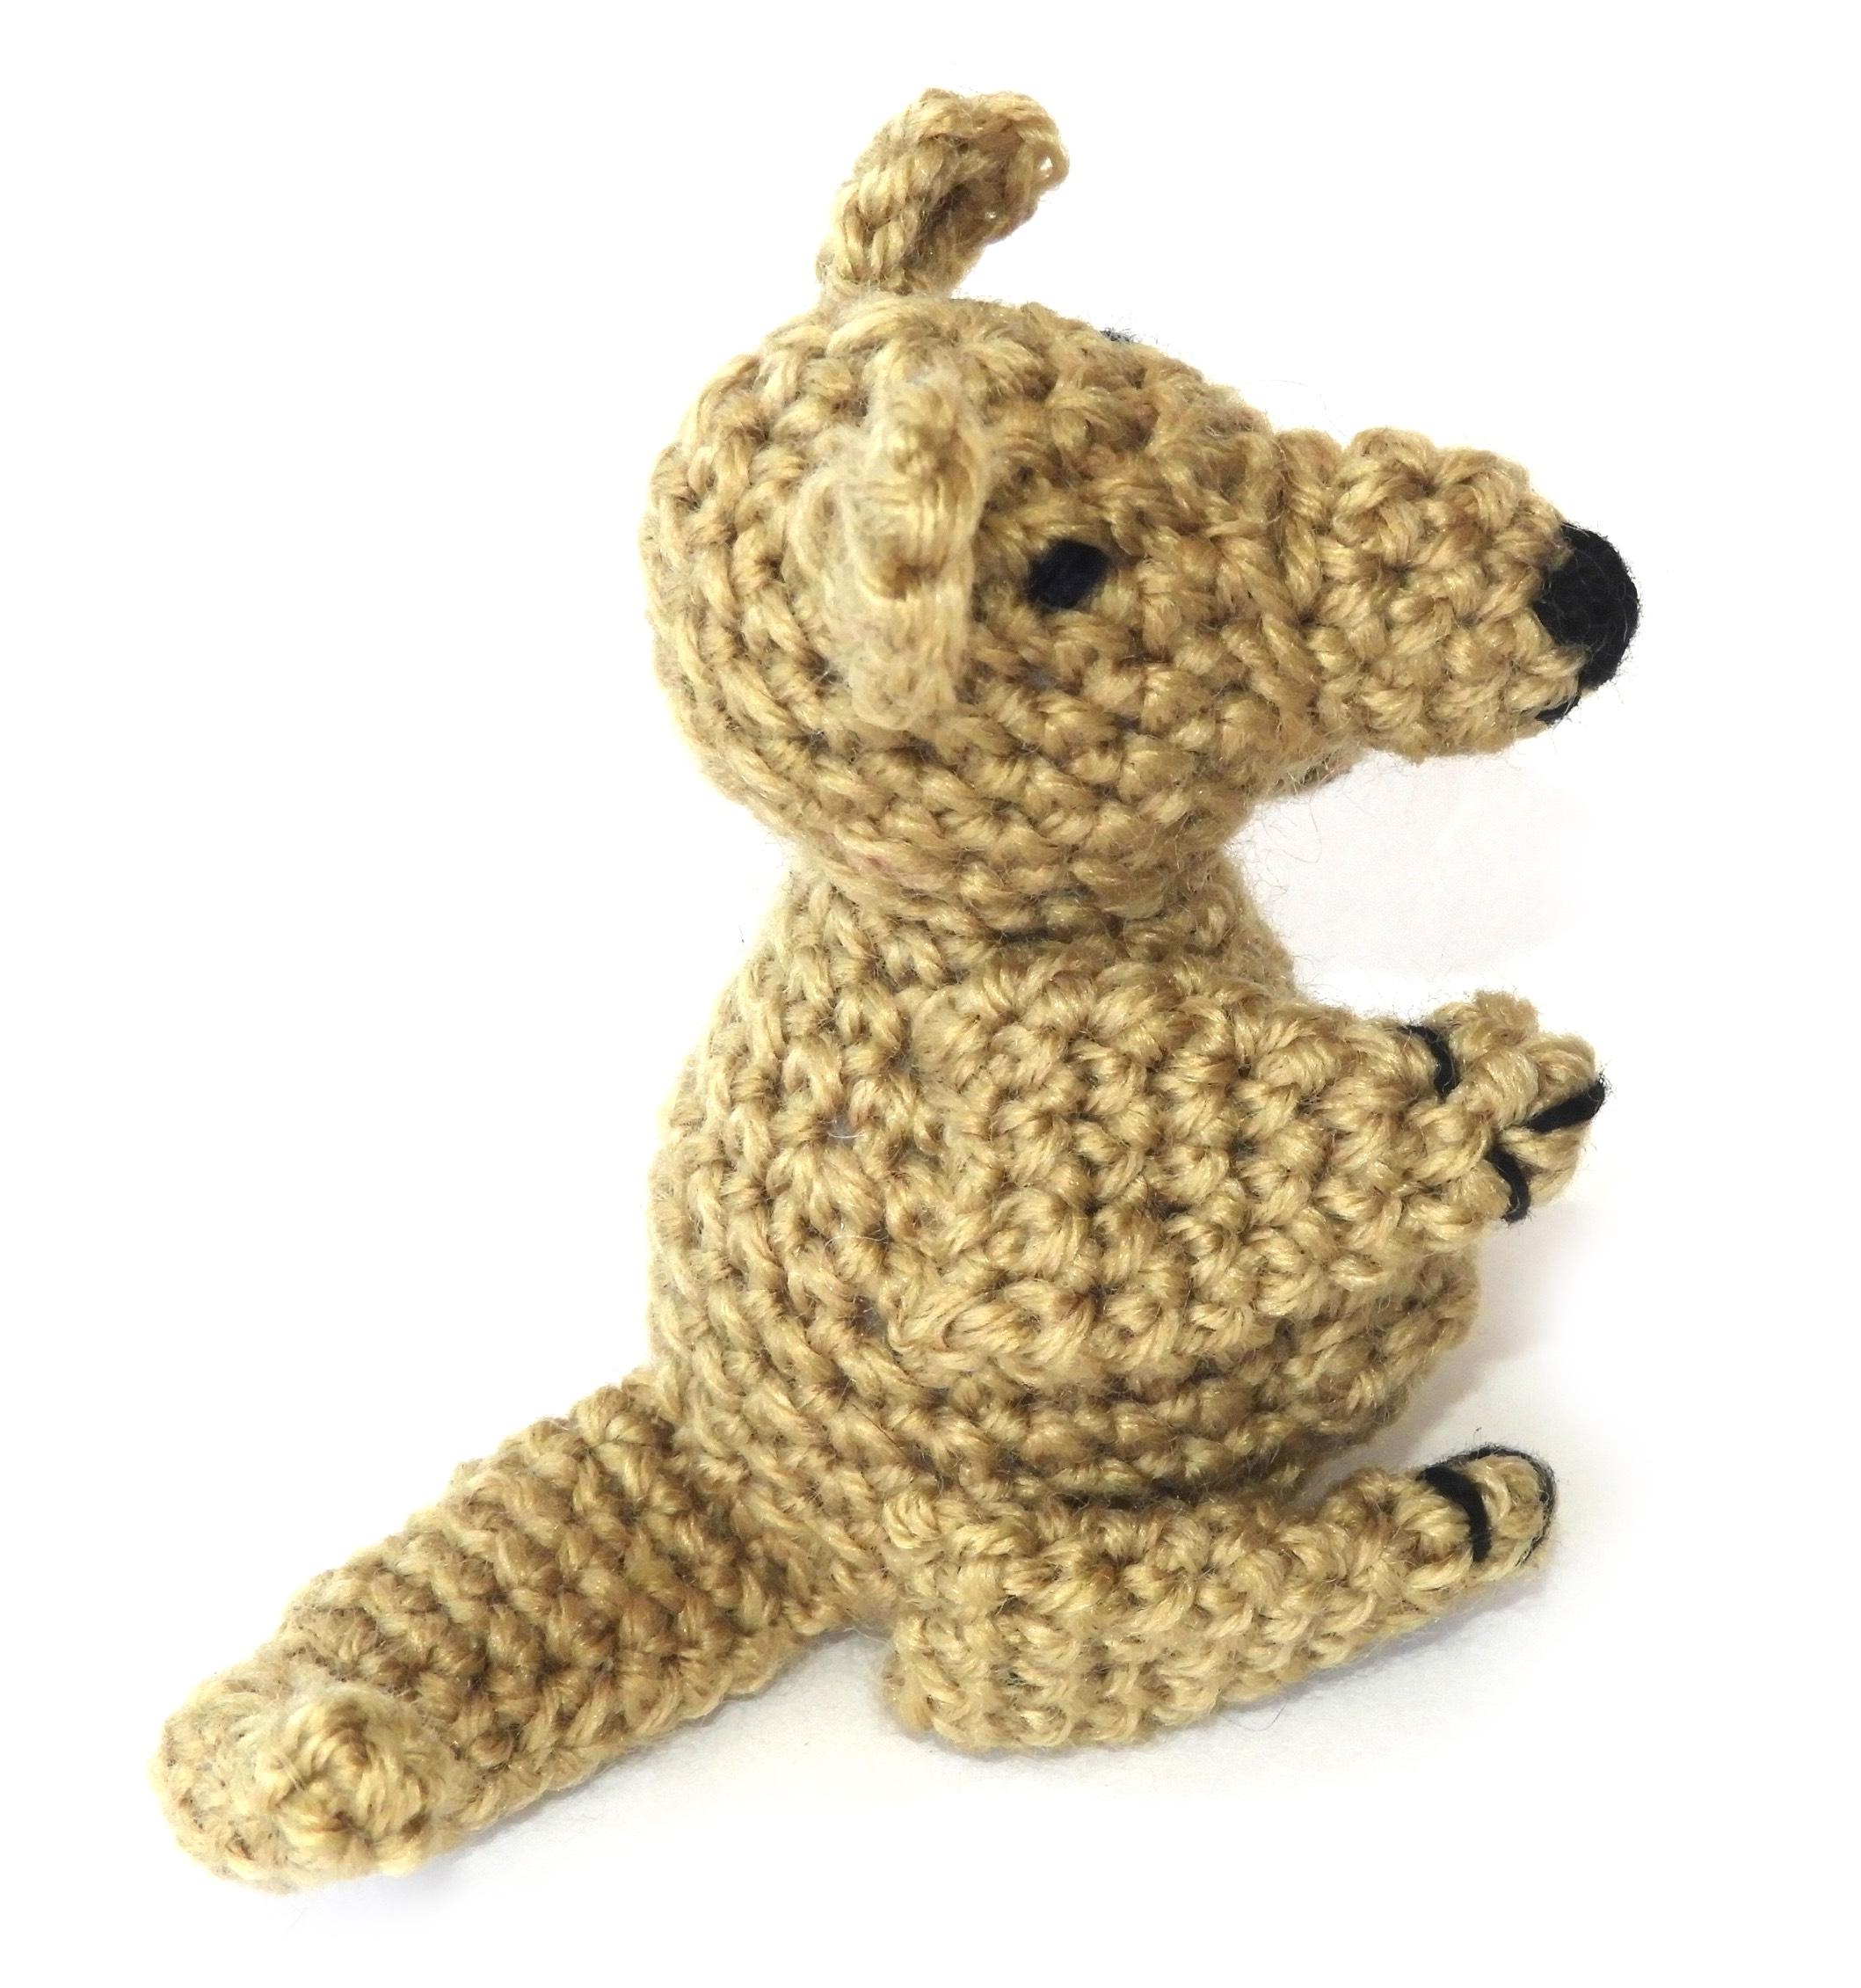 Crochet Amigurumi Kangaroo and Joey PATTERN ONLY, Mama Jill and ... | 2261x2117